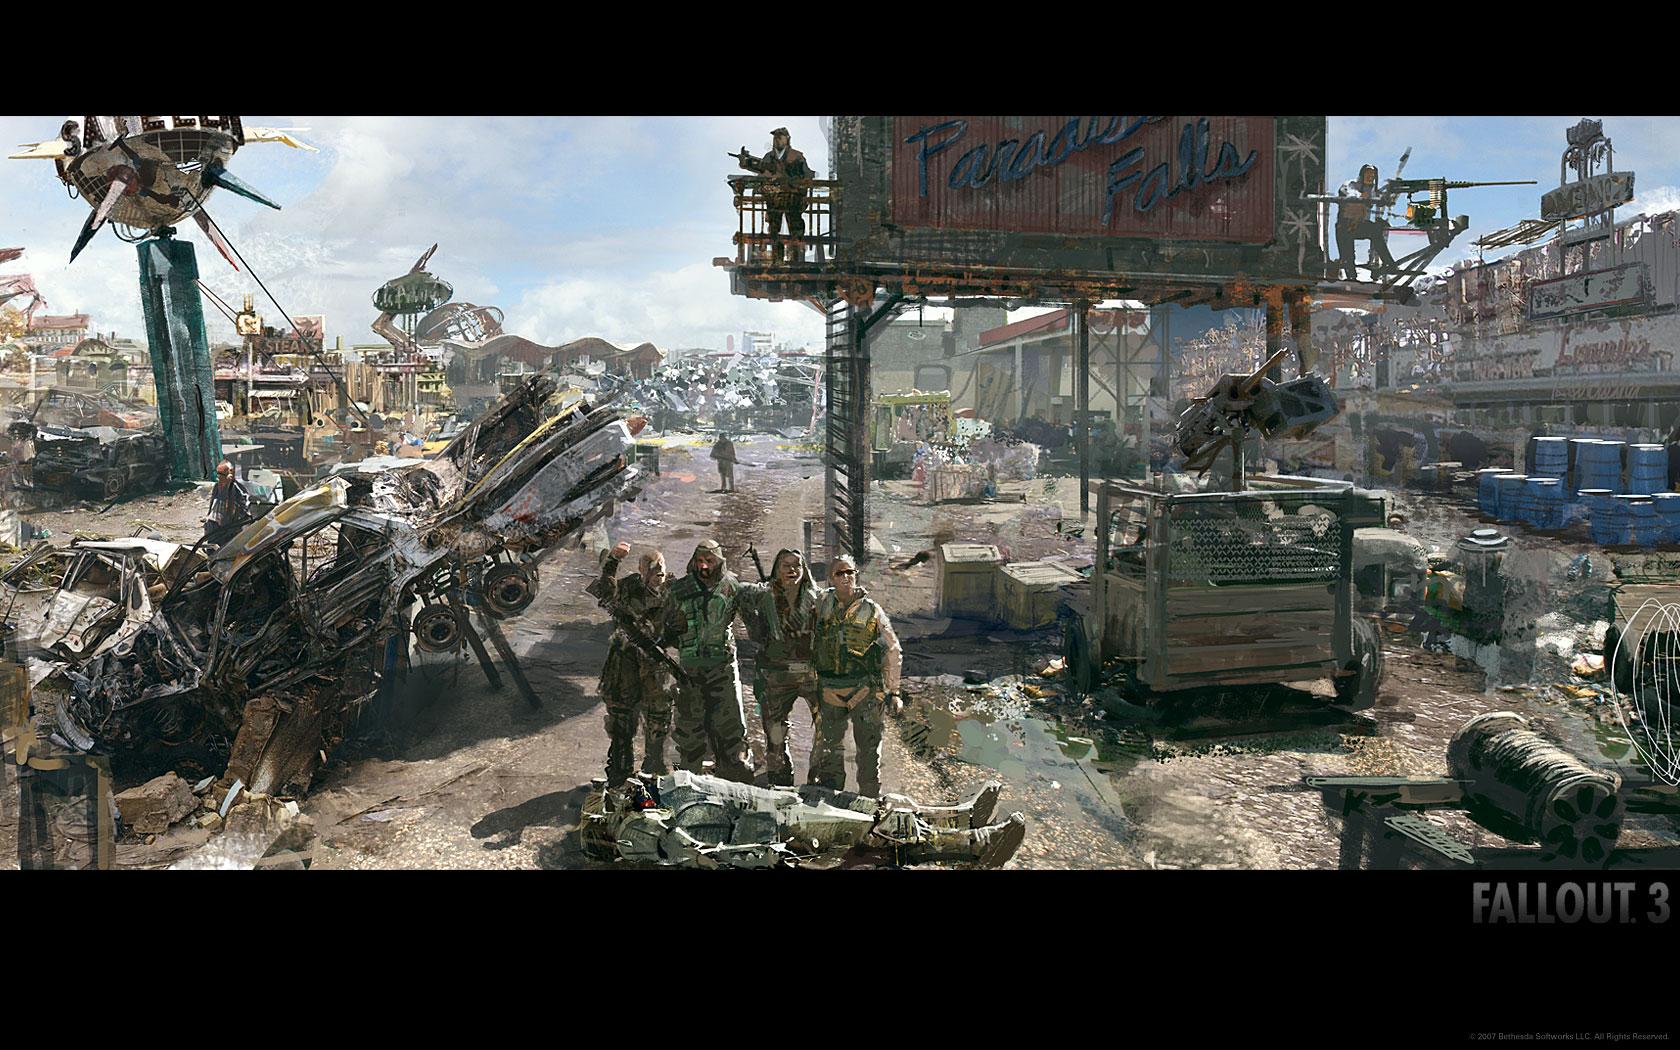 Fallout 4 Concept Art Fallout concept art wallpaper 1680x1050